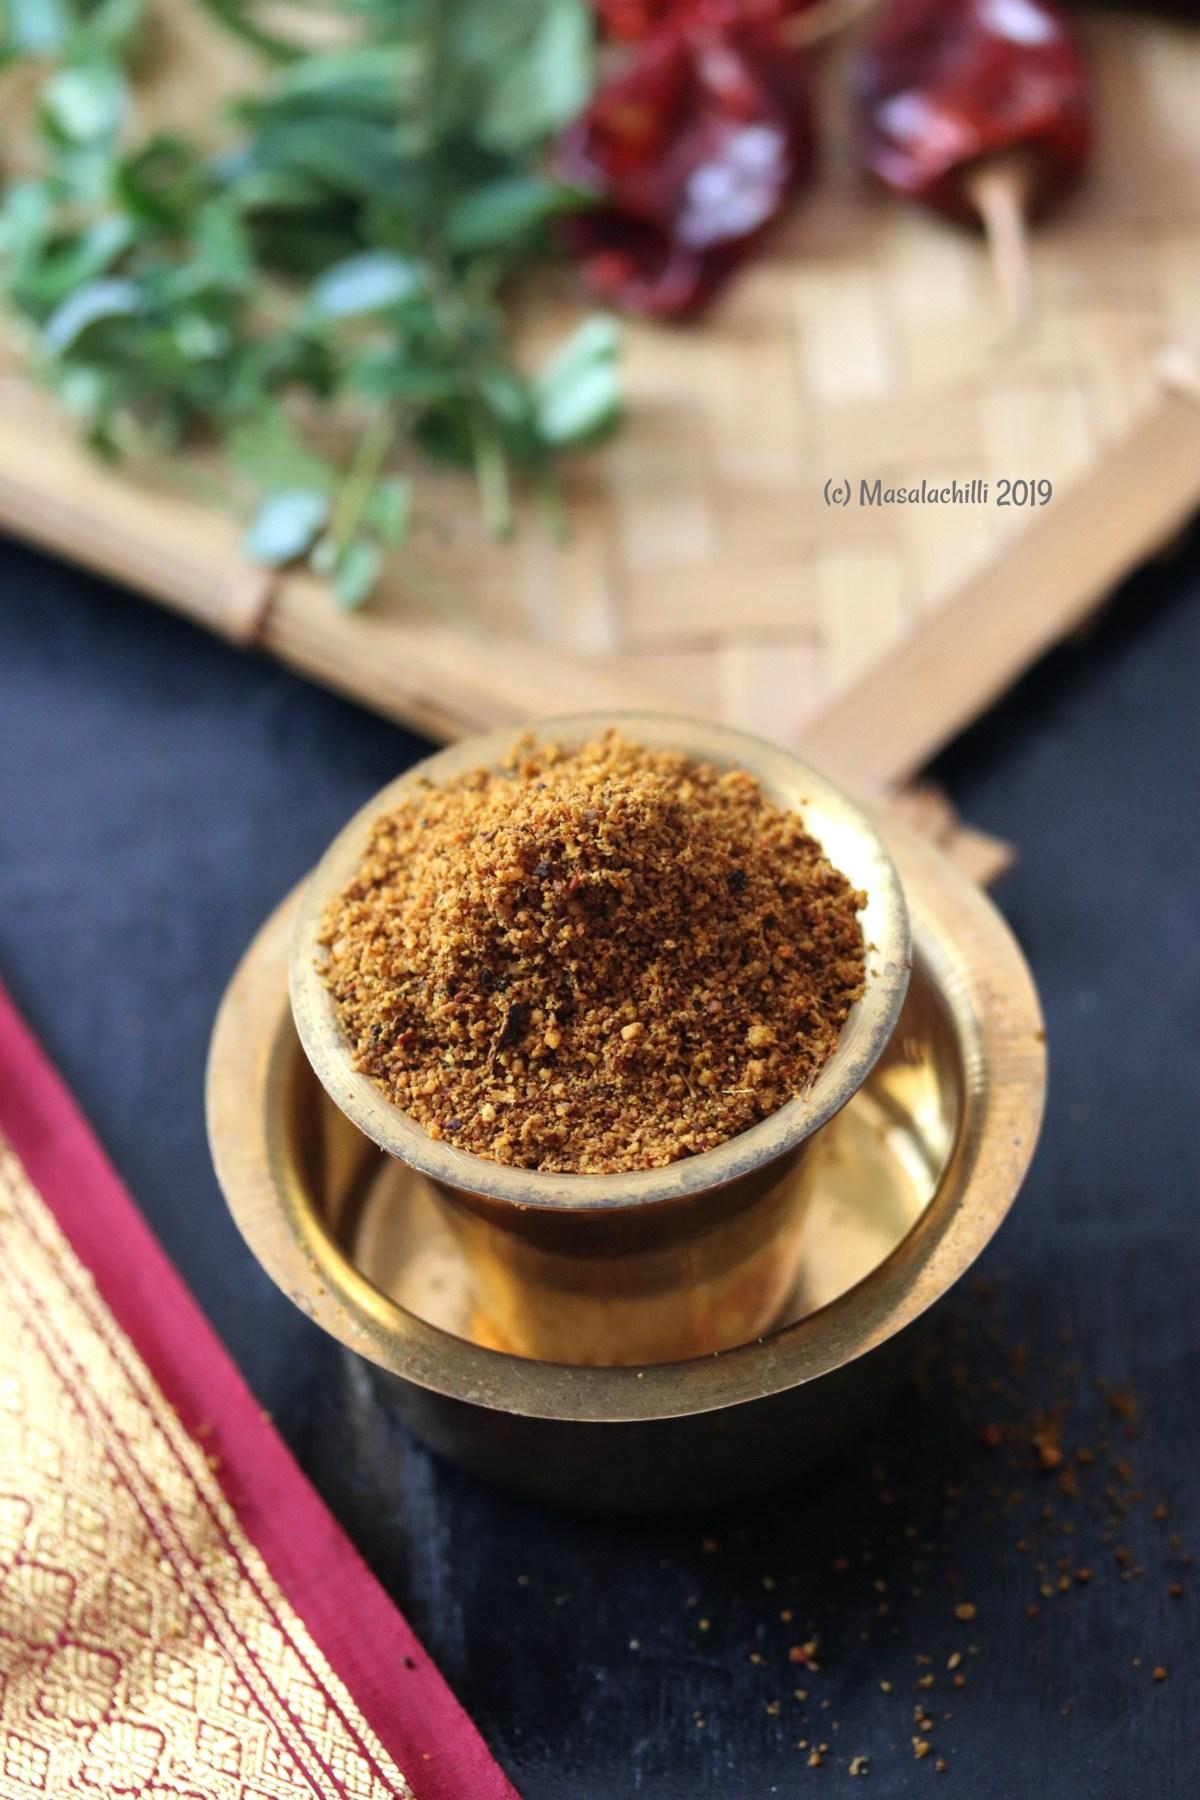 Karnataka special Bisi Bele Bath powder or Bisi Bele bath masala recipe